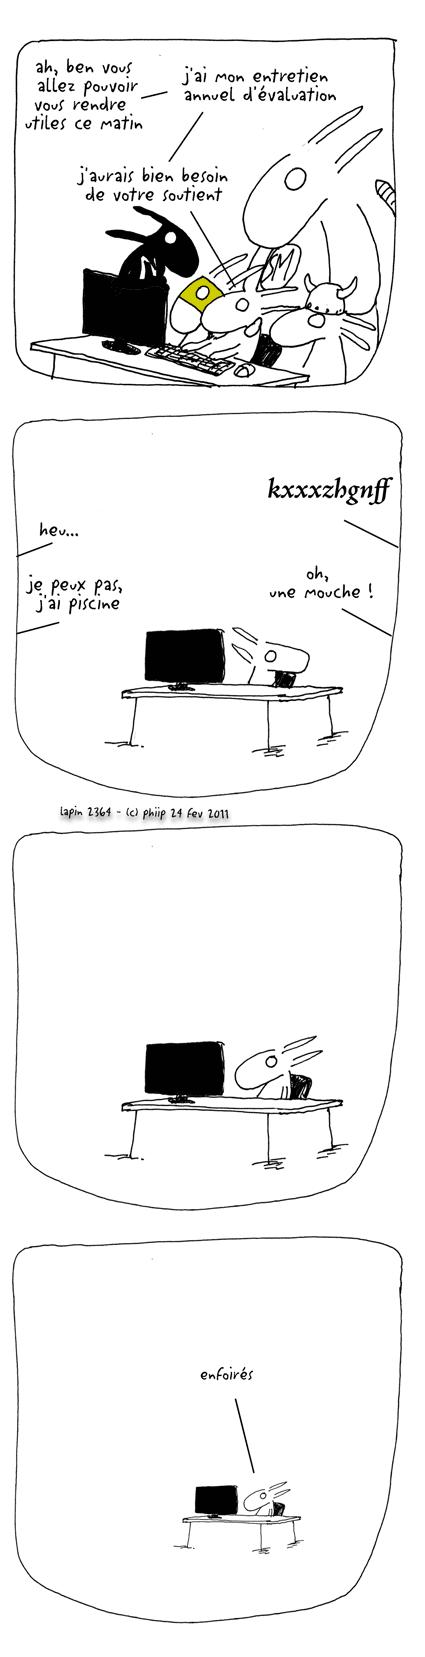 lapin bd humoristique quotidienne entretien annuel valuation. Black Bedroom Furniture Sets. Home Design Ideas